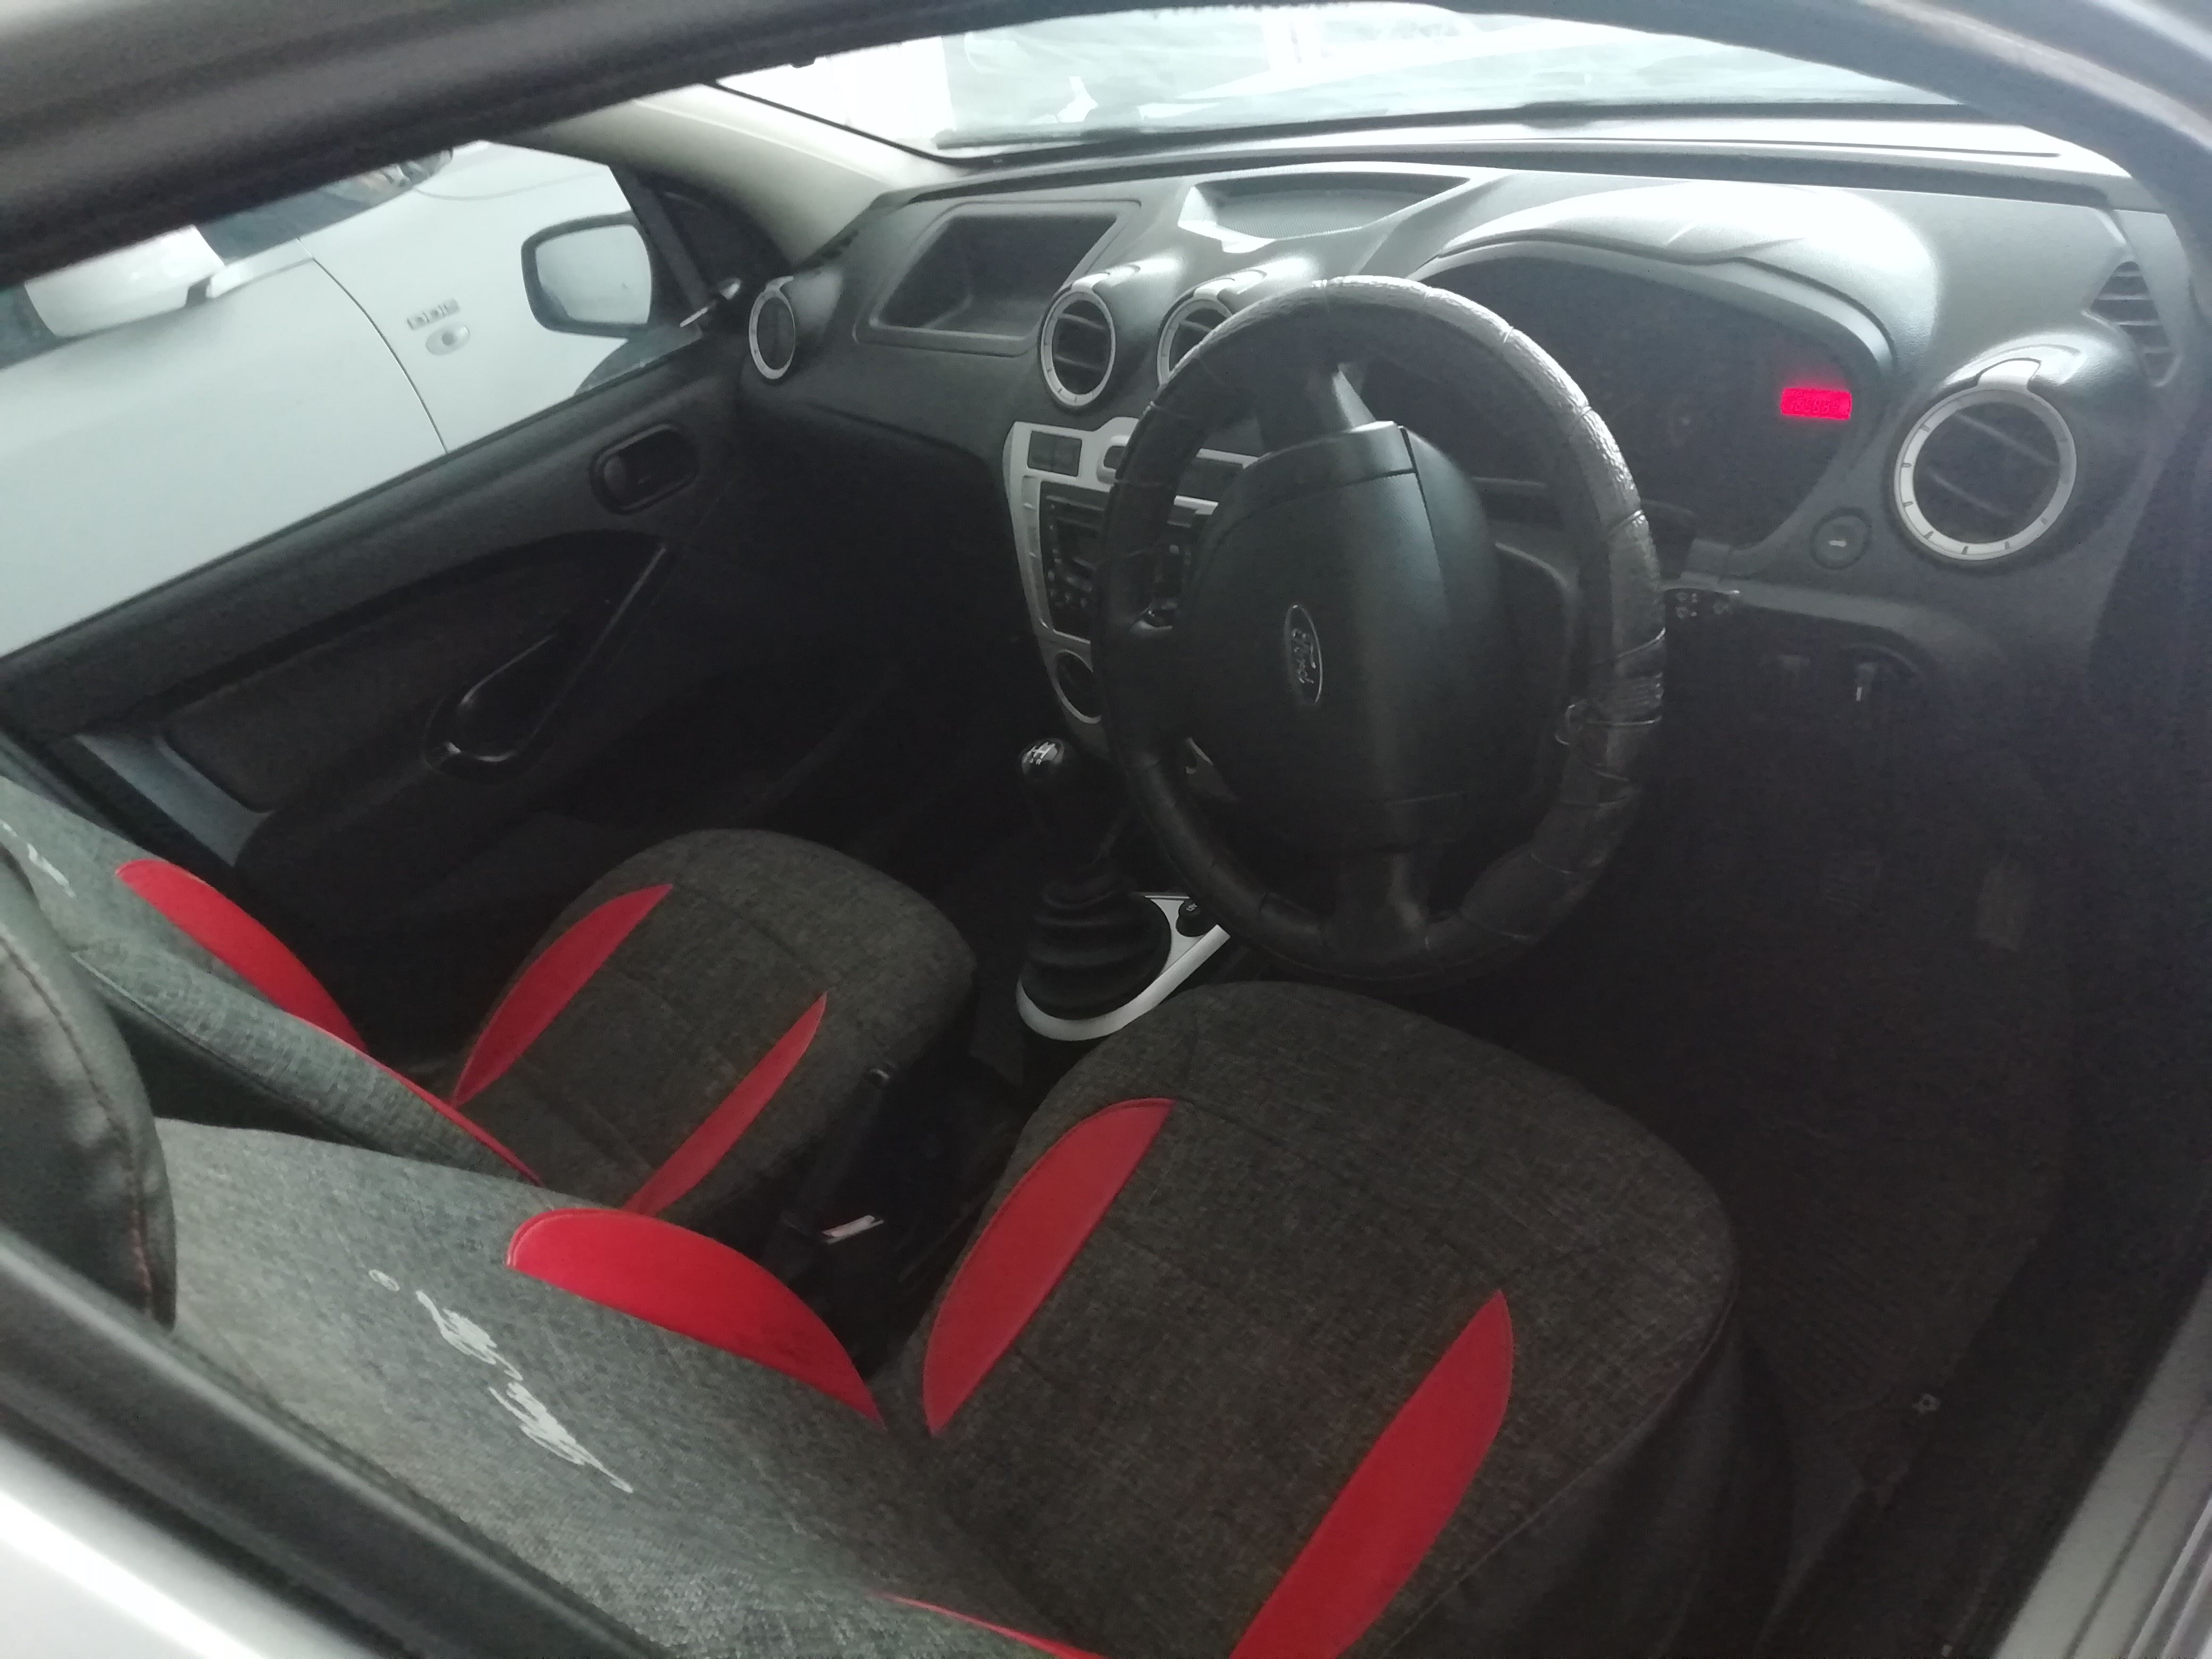 2010 Used Ford Figo EXI DURATORQ 1.4